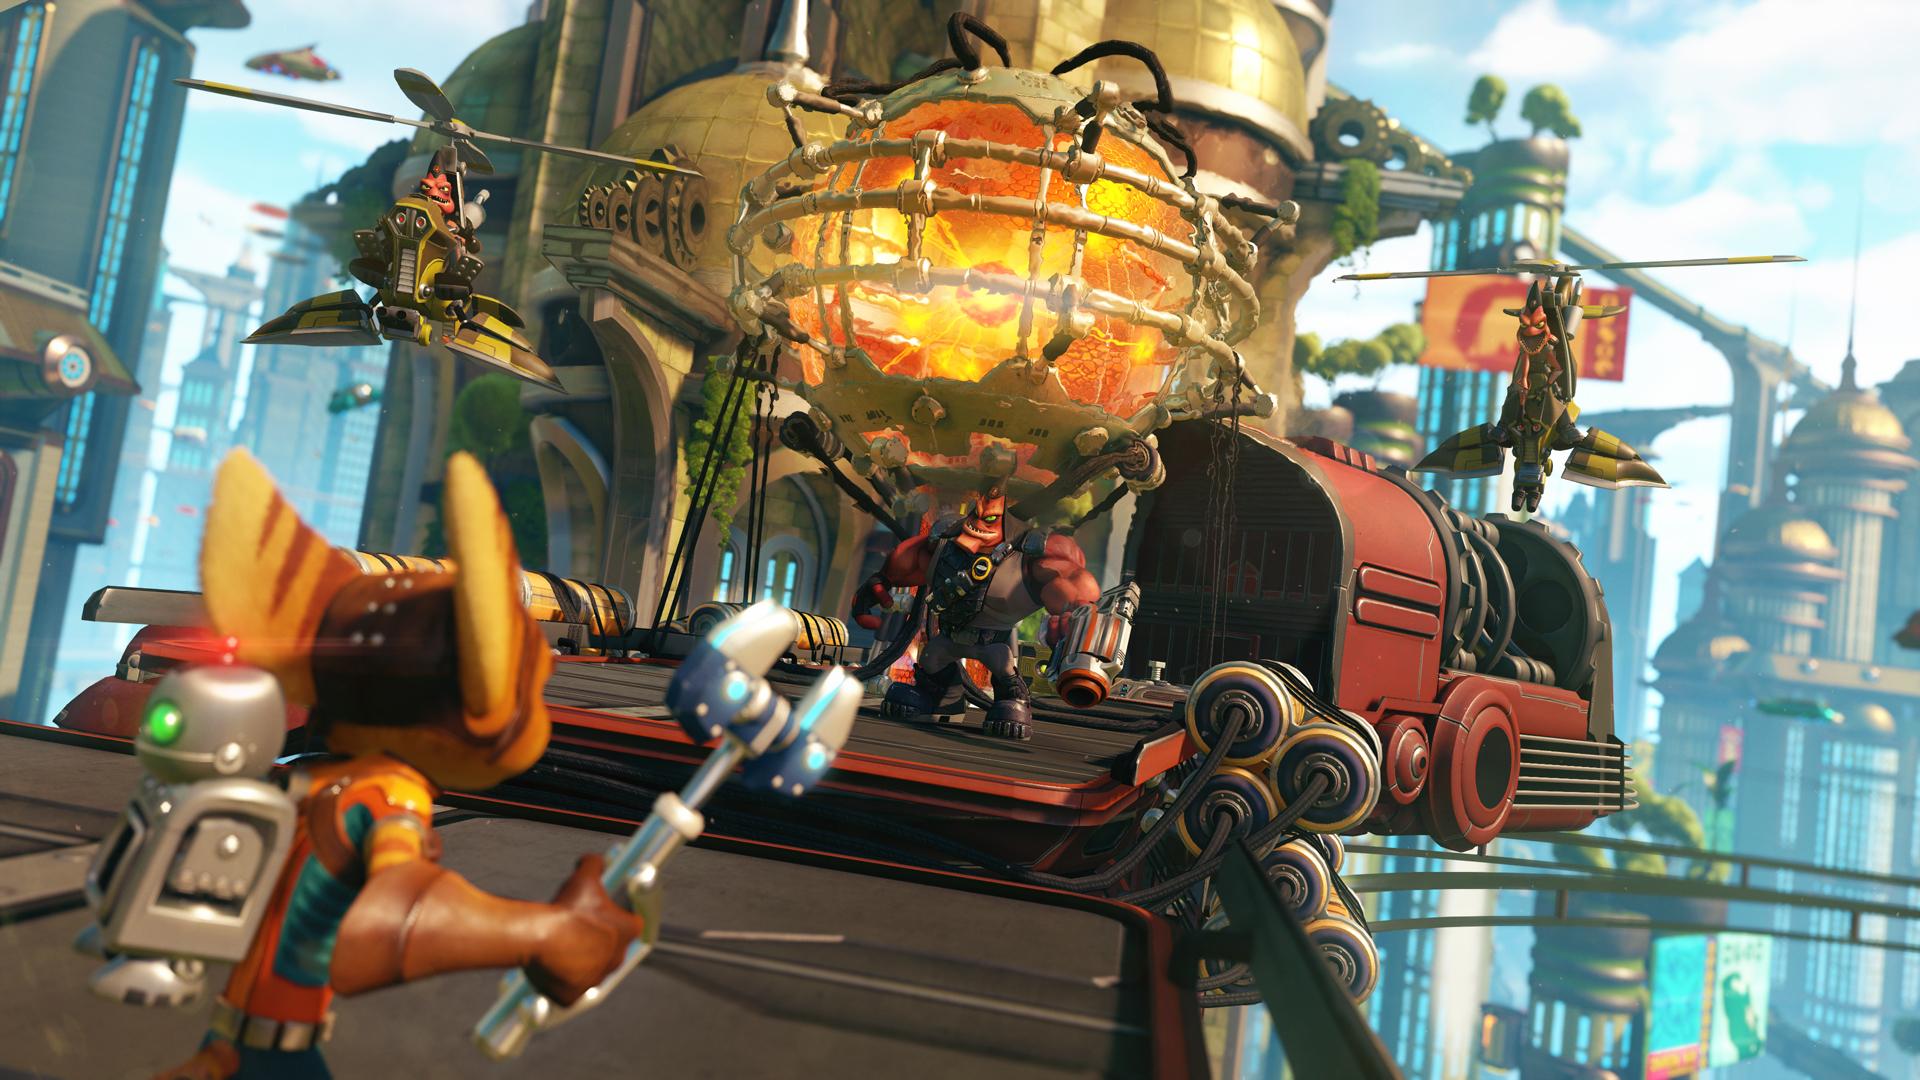 Ratchet & Clank PS4 Screenshot 3